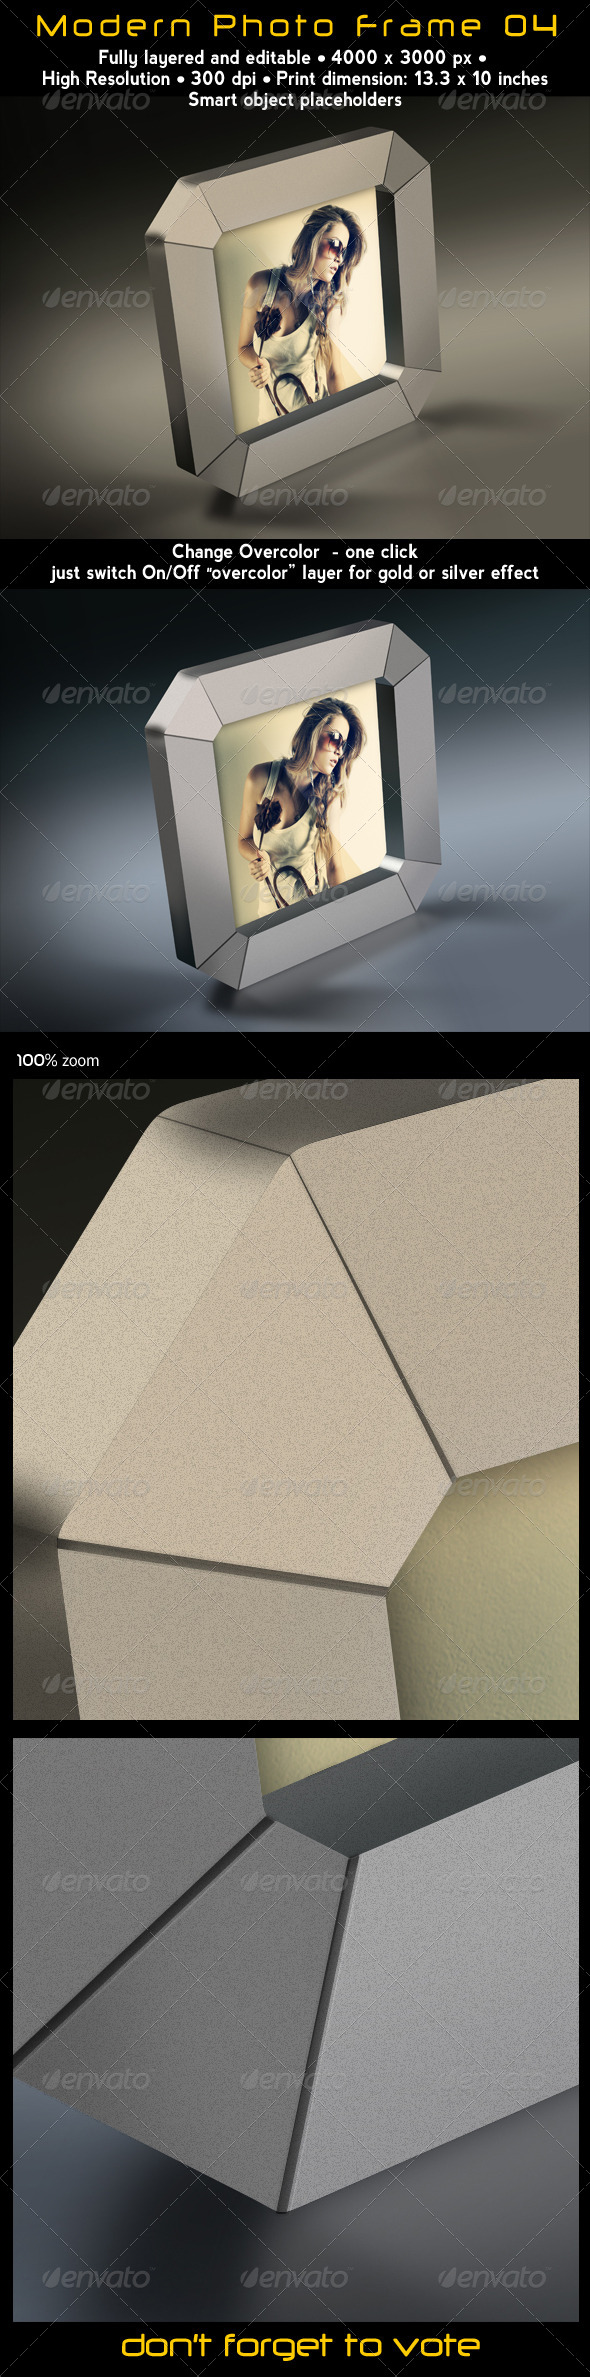 GraphicRiver Modern Photo Frame 04 5903164